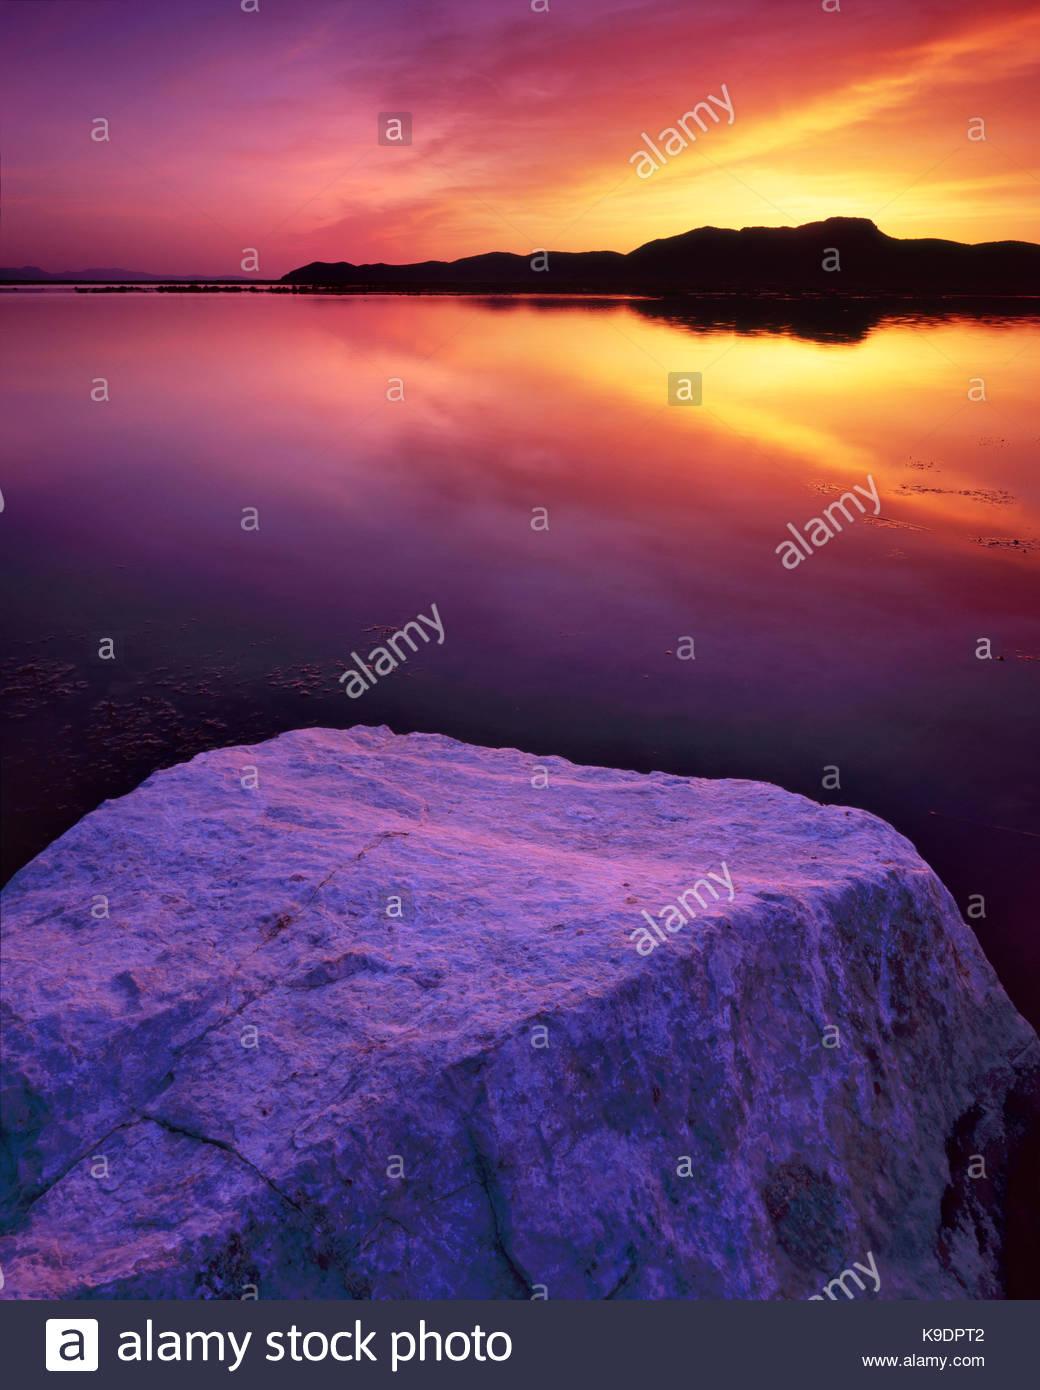 Rock and Lake at Dawn, Ruby Lake National Wildlife Refuge, Nevada - Stock Image